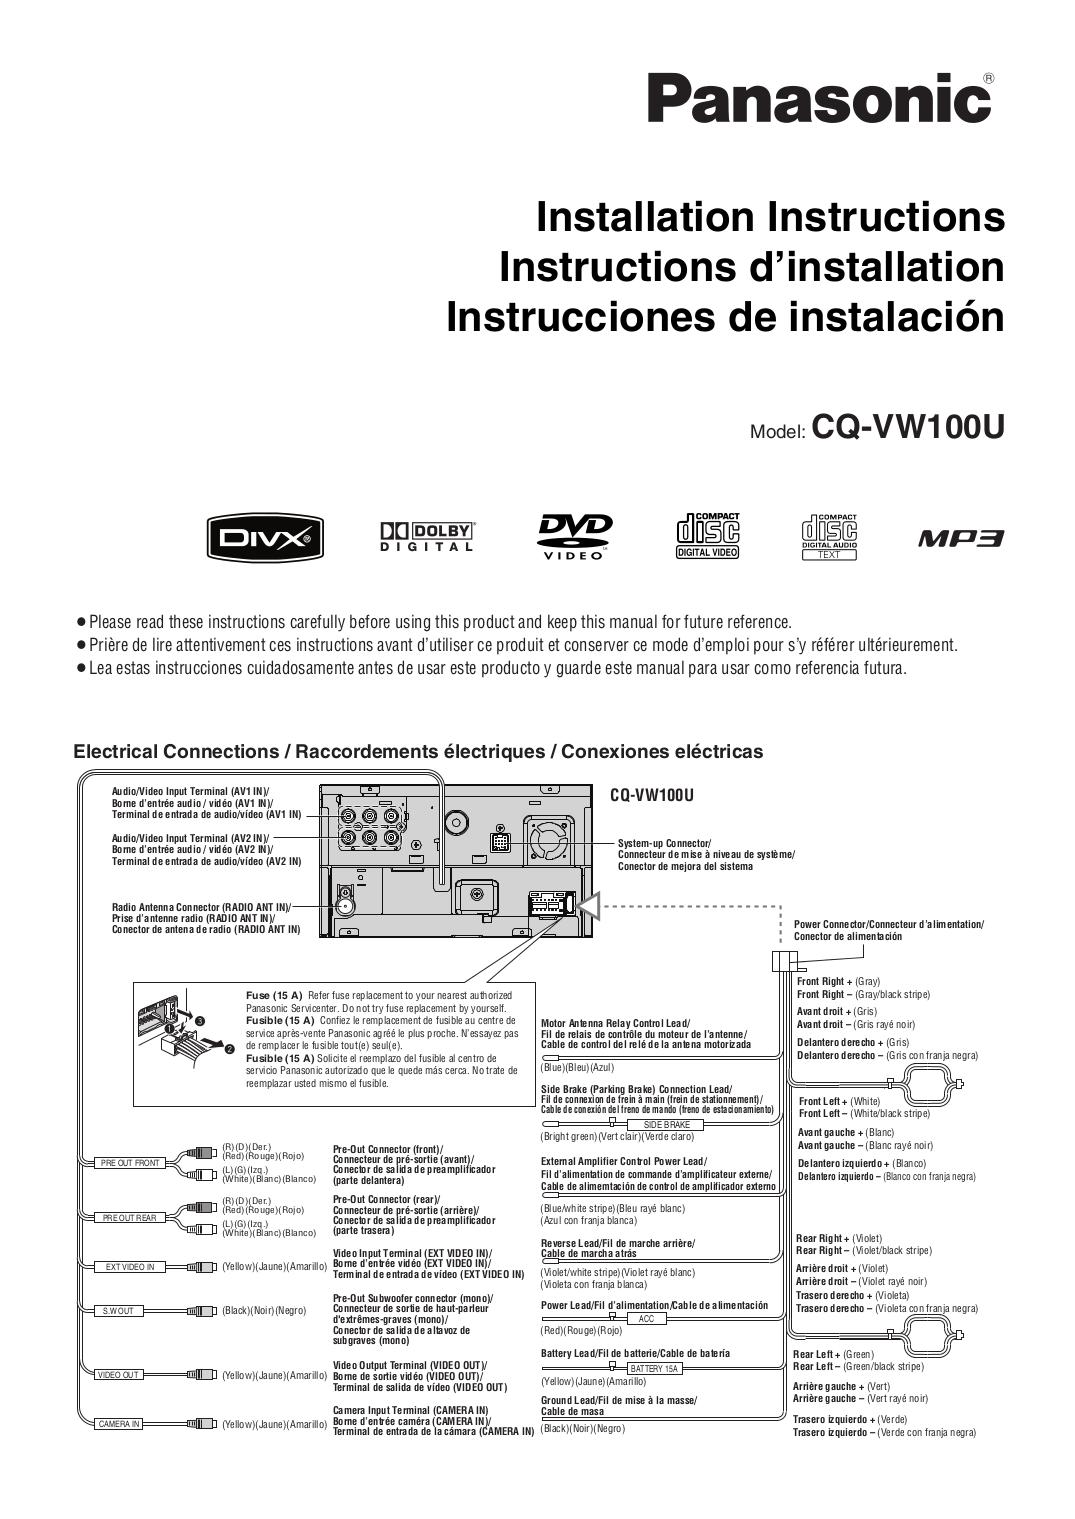 Panasonic Cq Vd6503U Wiring Diagram from schematron.org